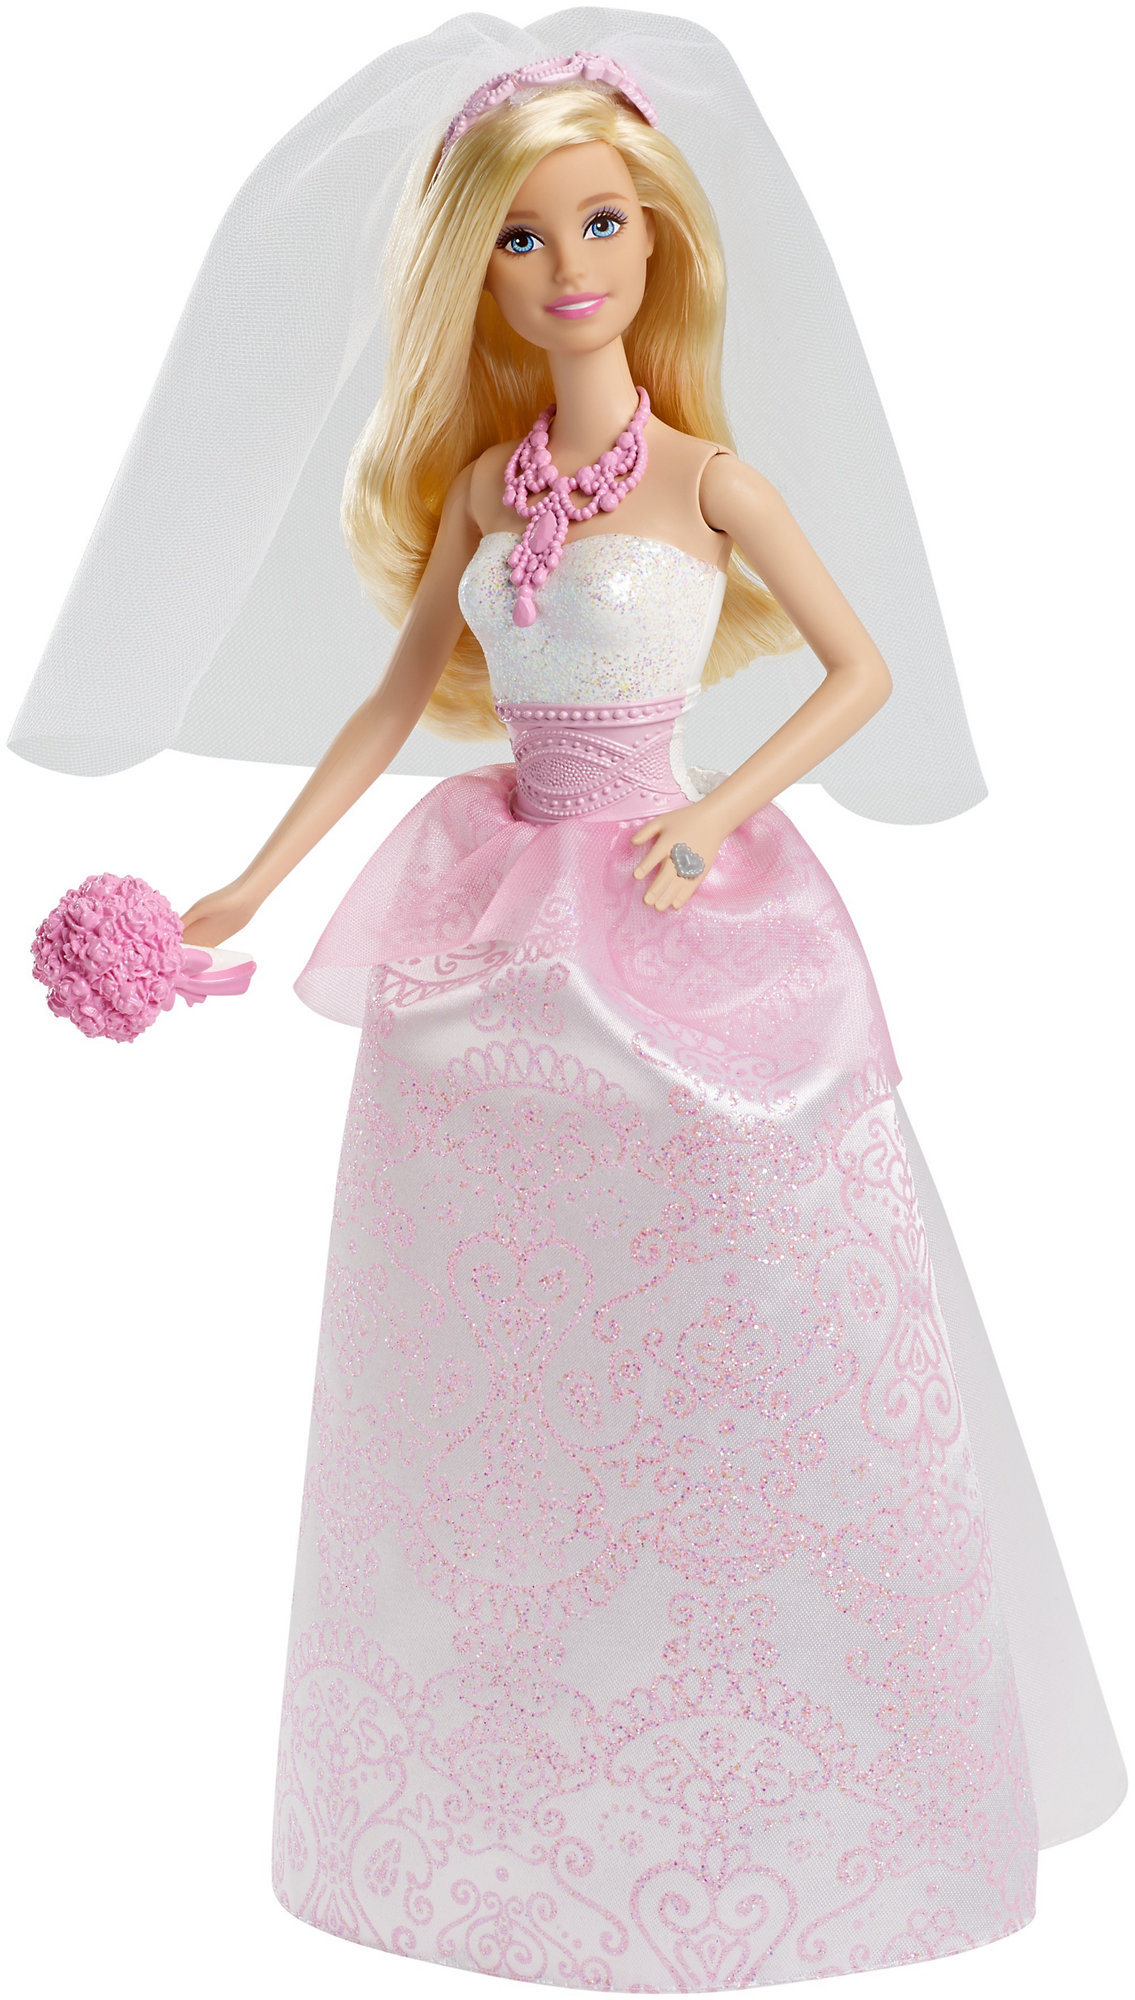 Barbie Royal Bride Doll by Mattel